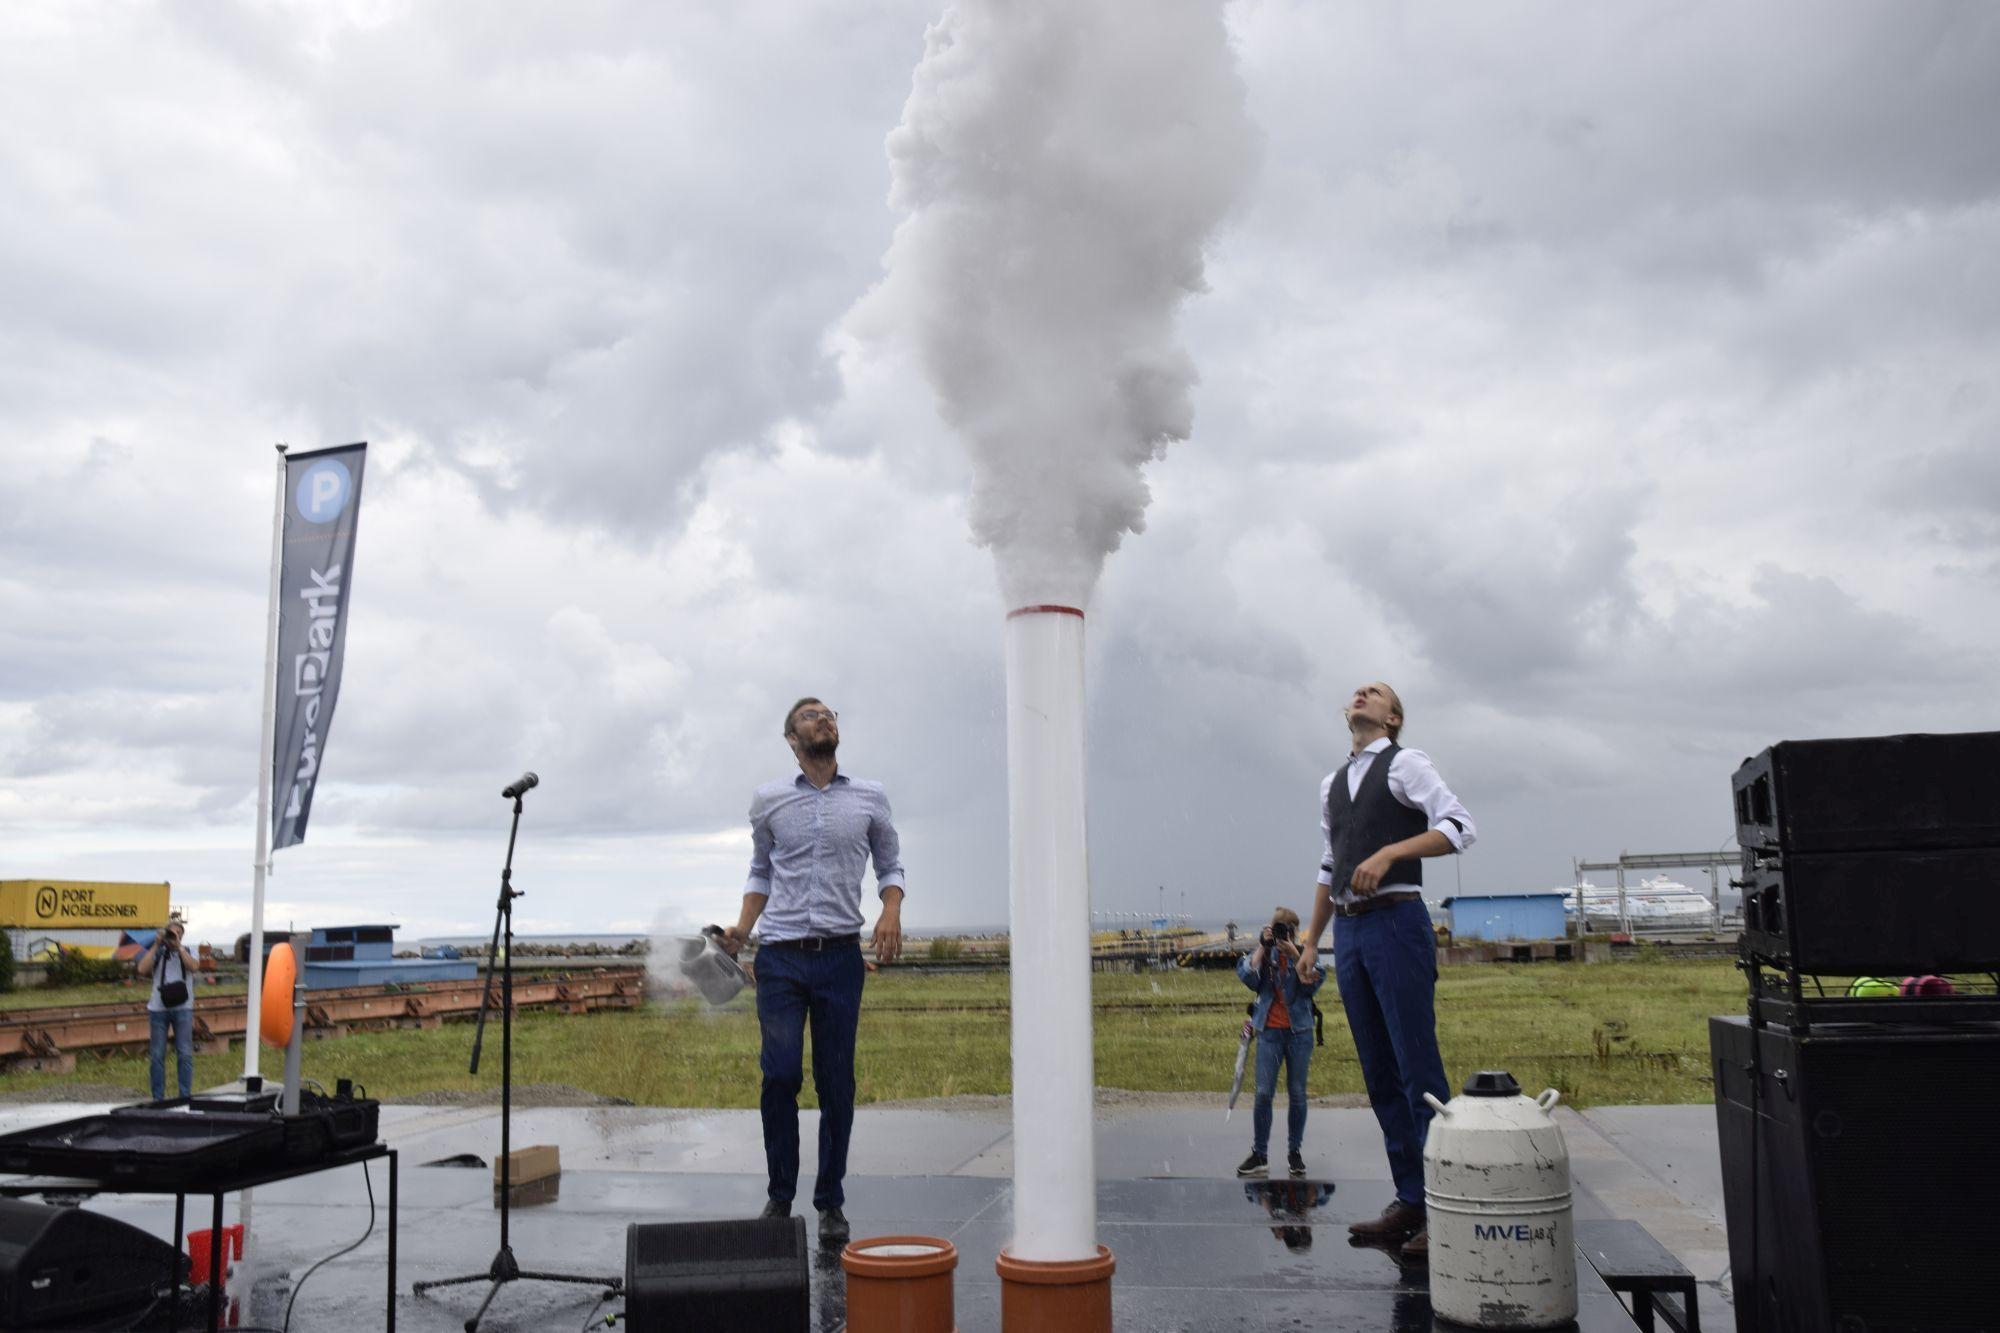 Foto: Teadusteater näitab gaasi survet. Janek Jõgisaar, Bioneer.ee